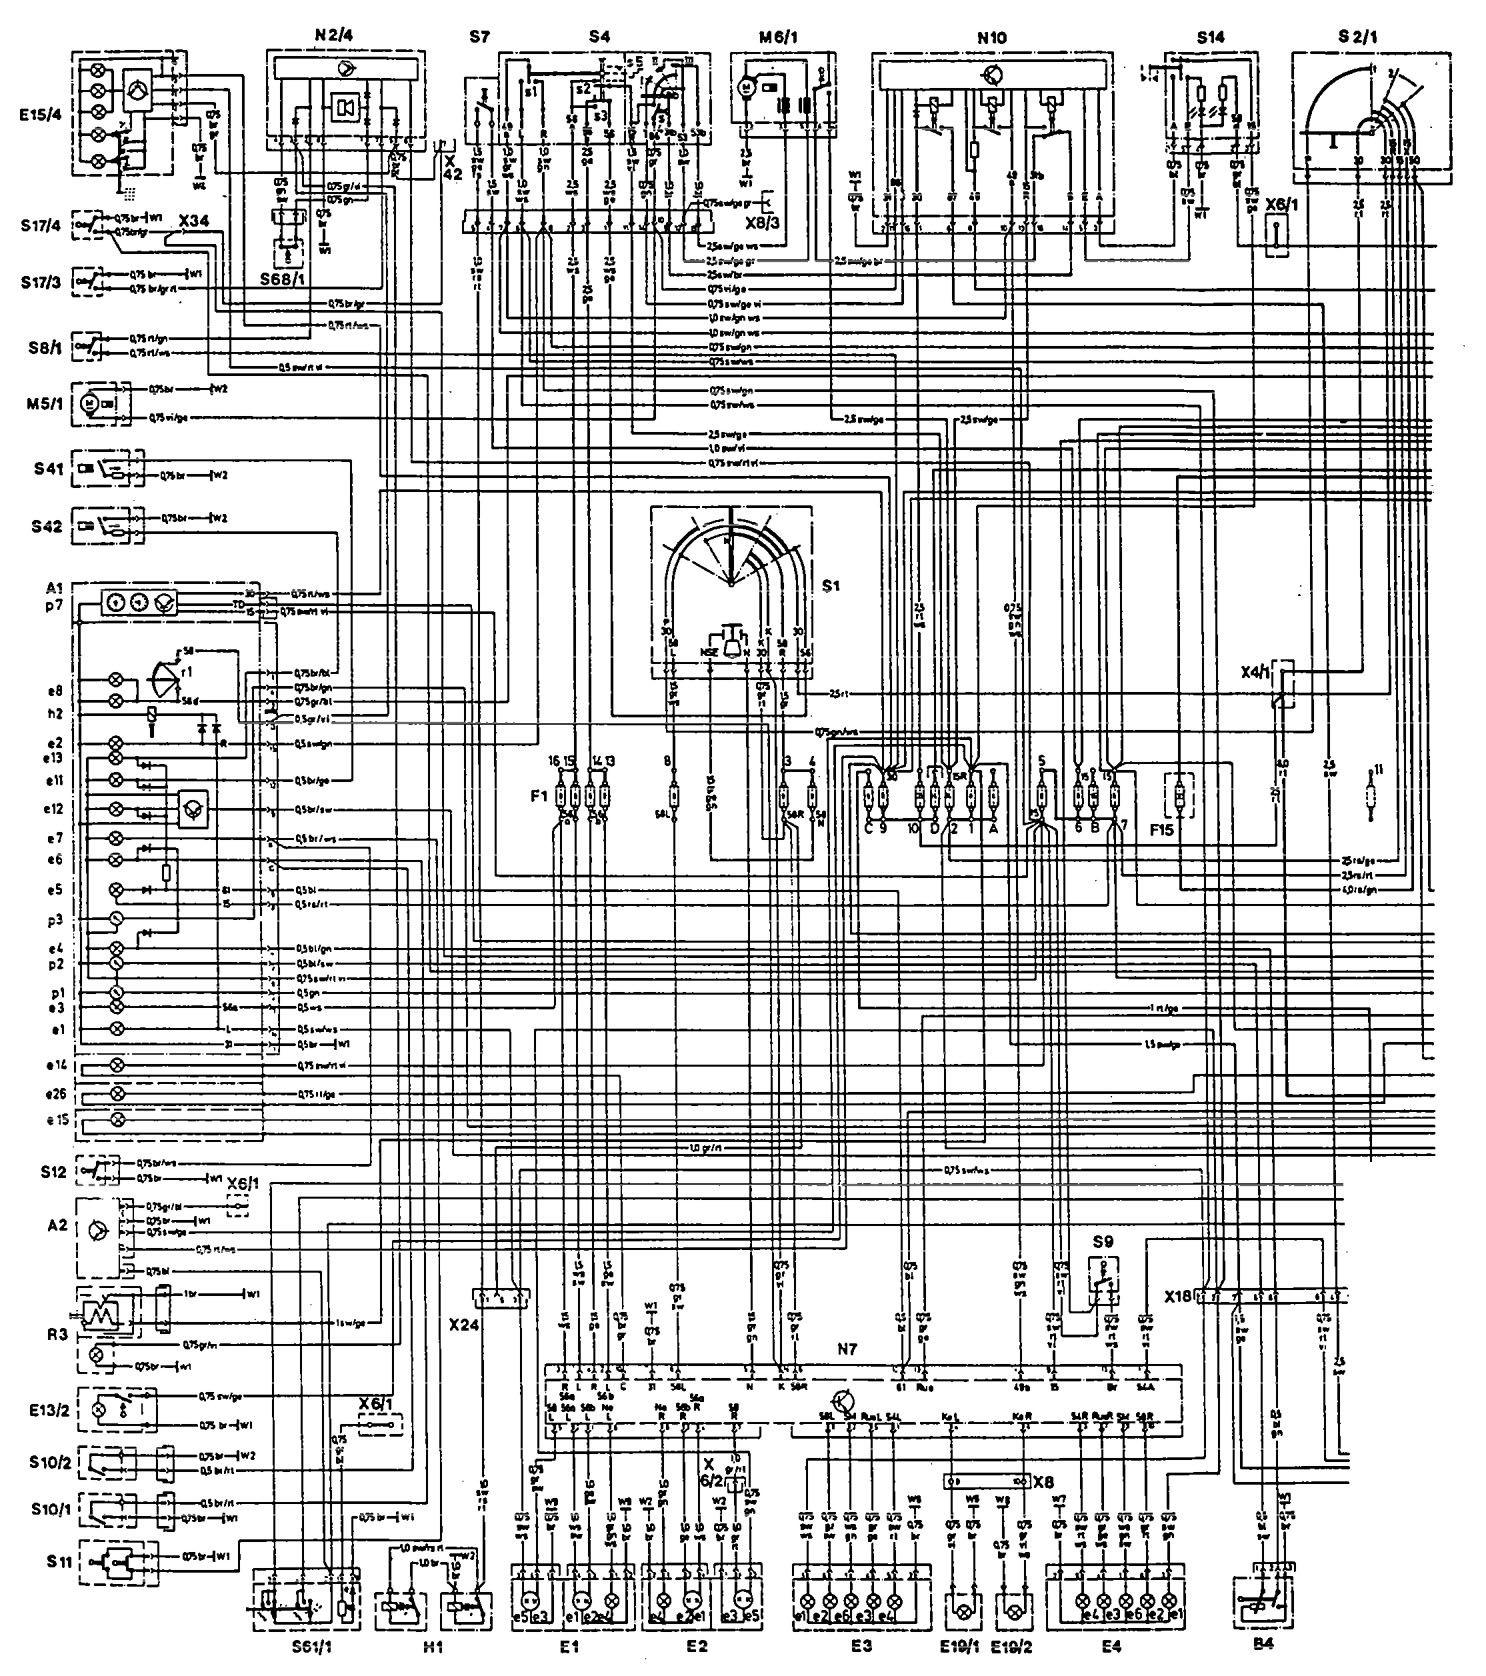 Mercedes Benz 300te 1992 1993 Wiring Diagrams Cooling Fans Fan Diagram Part 1